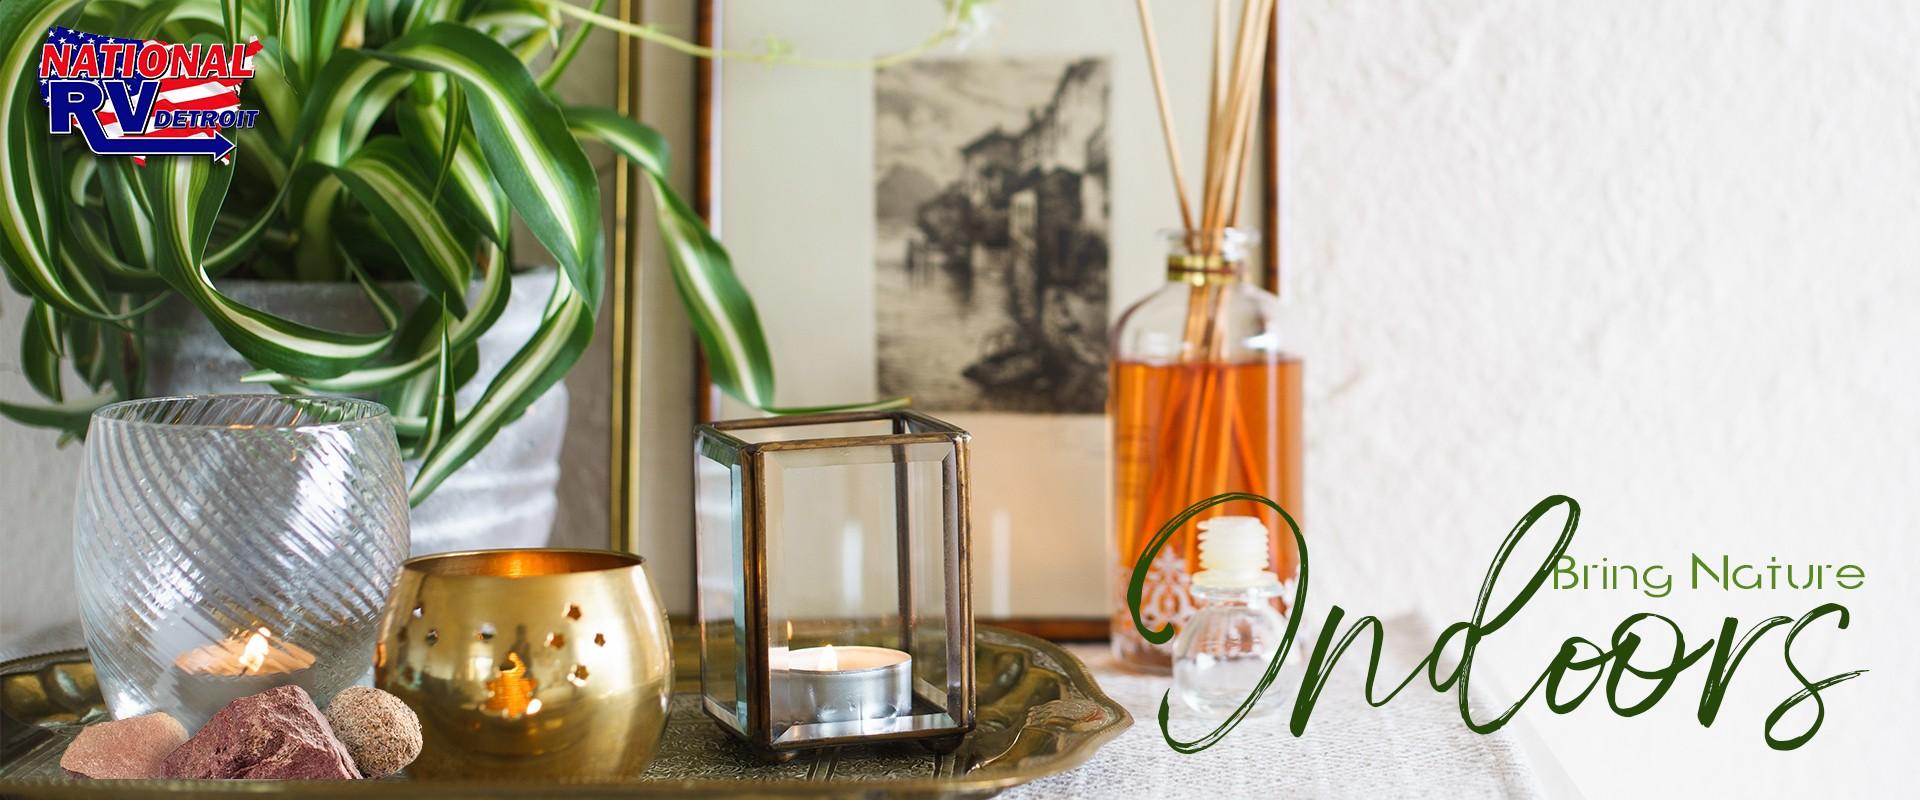 Bring nature indoors - home decor using rocks